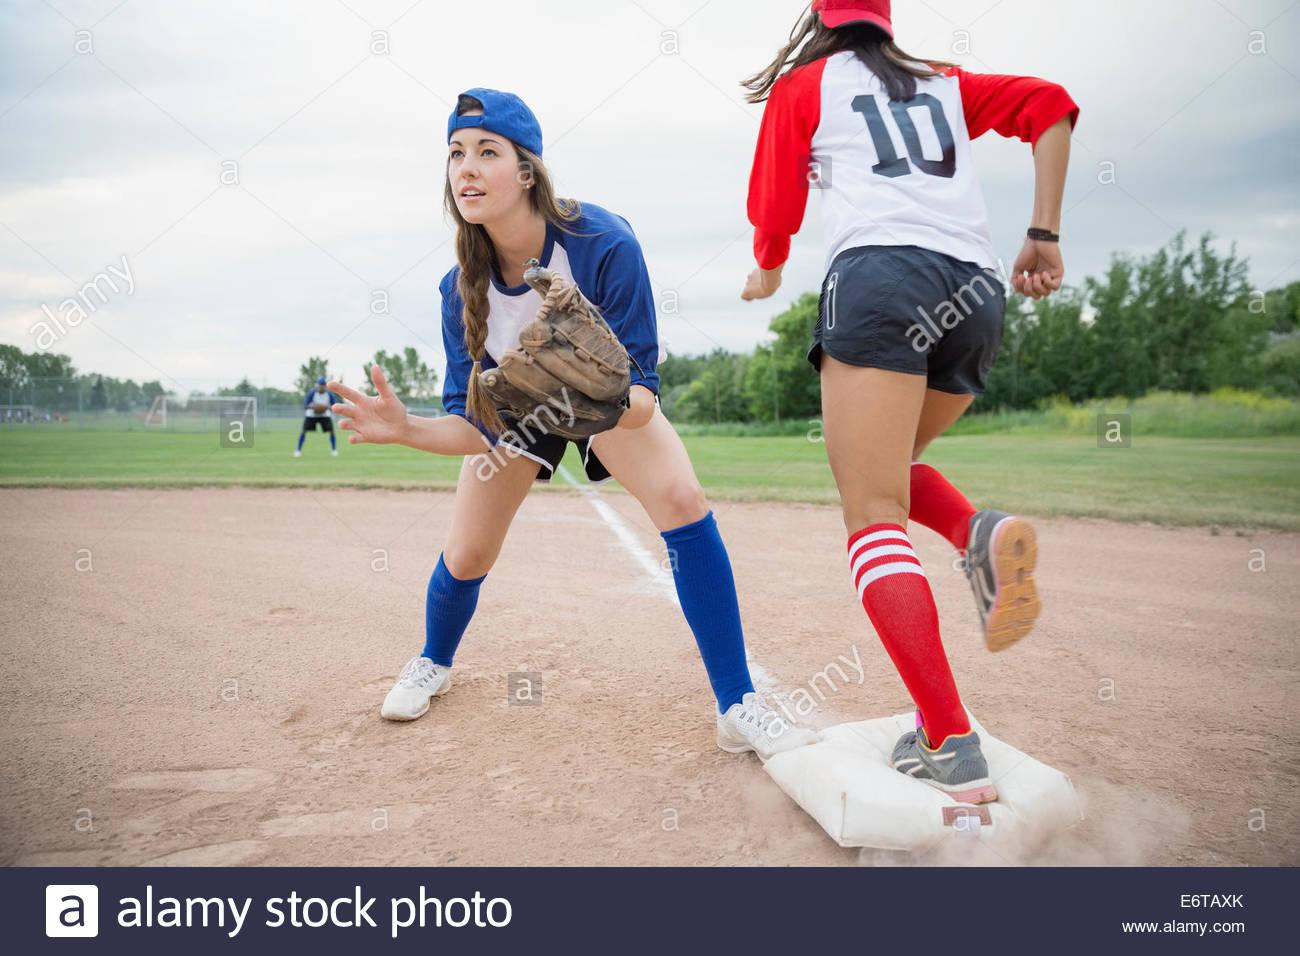 Baseball player ready to catch ball at base - Stock Image